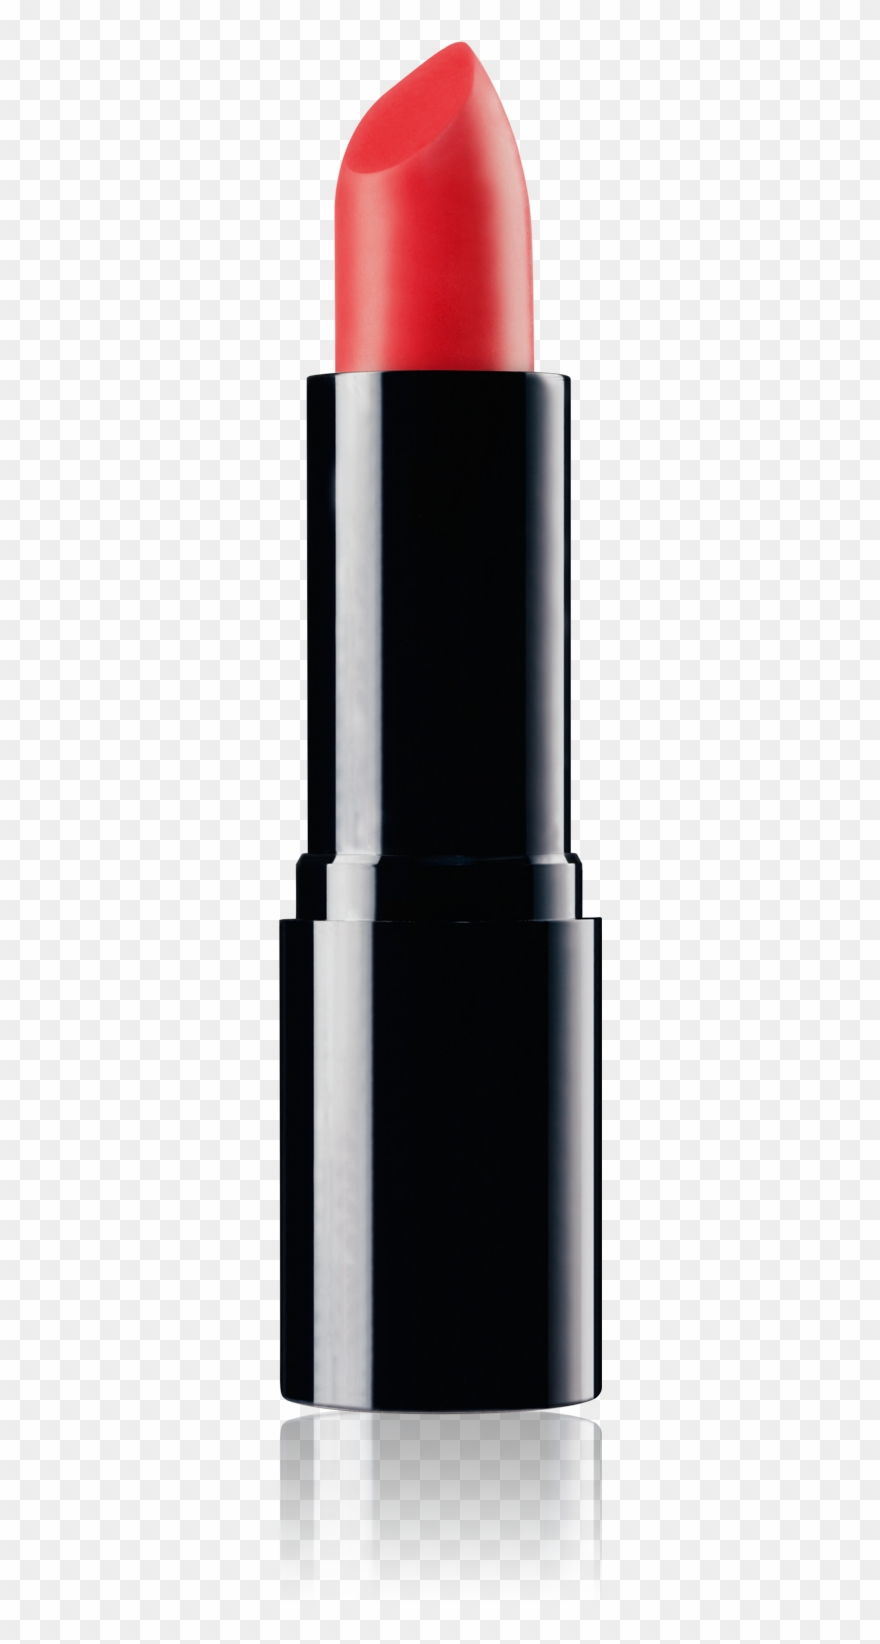 Lipstick Clipart Transparent Background.